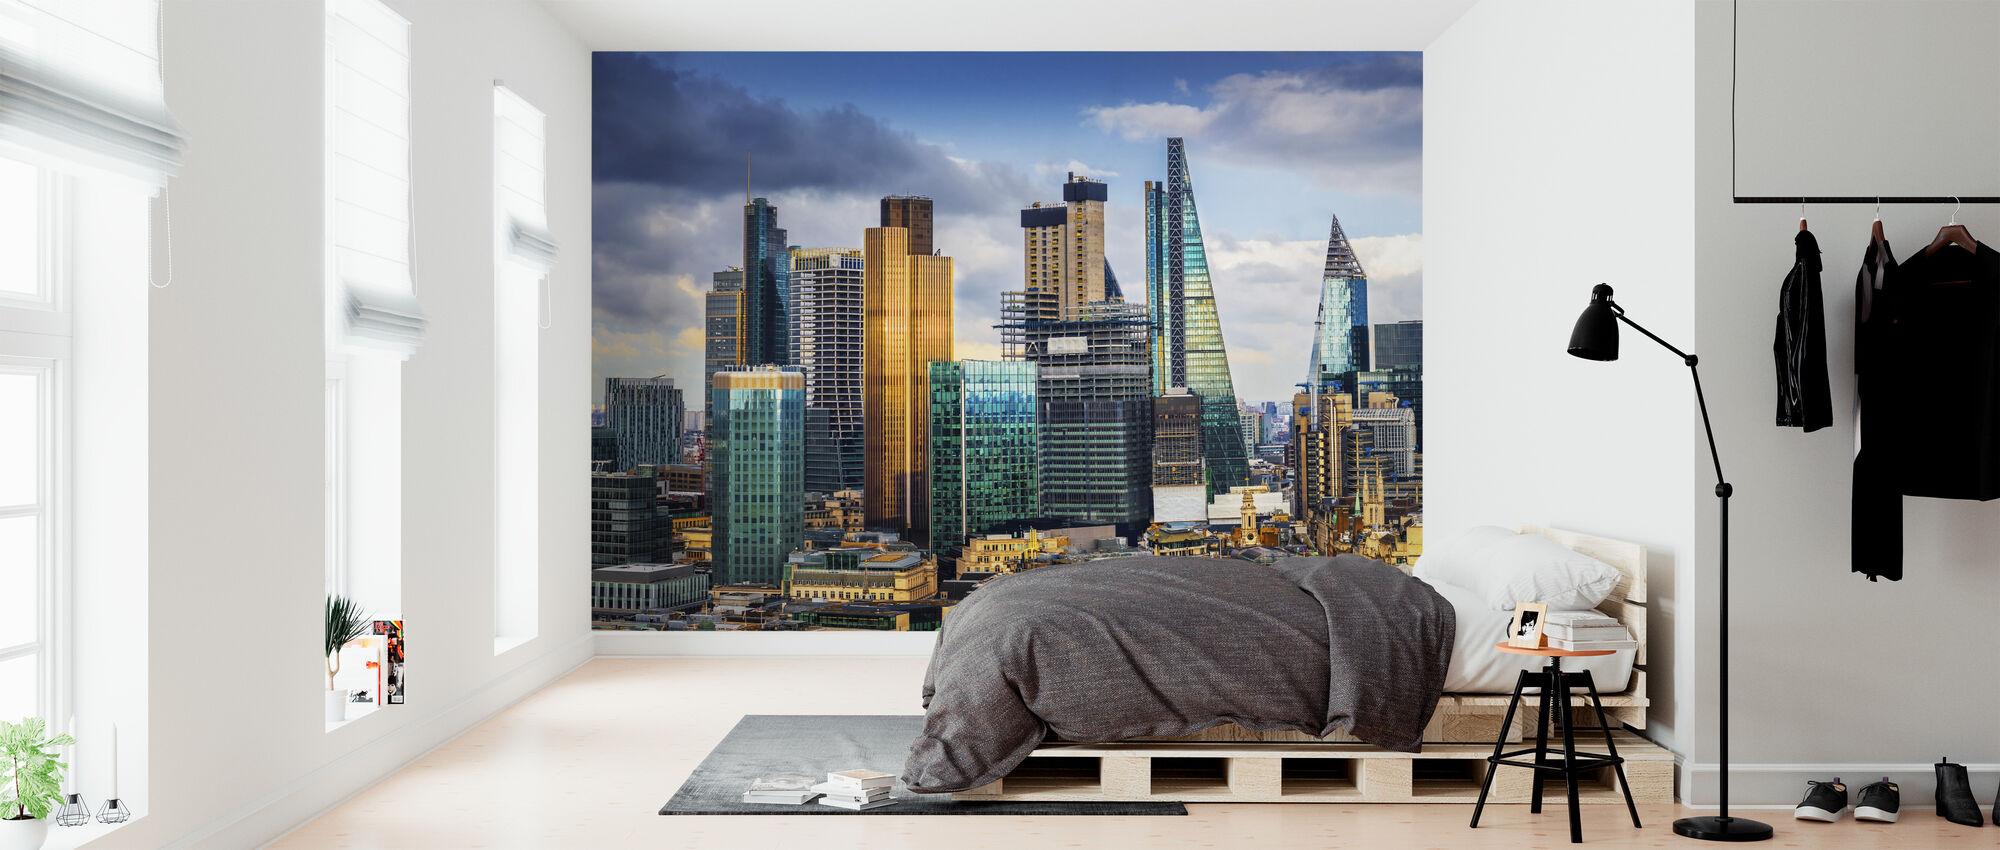 London Skyline - Wallpaper - Bedroom